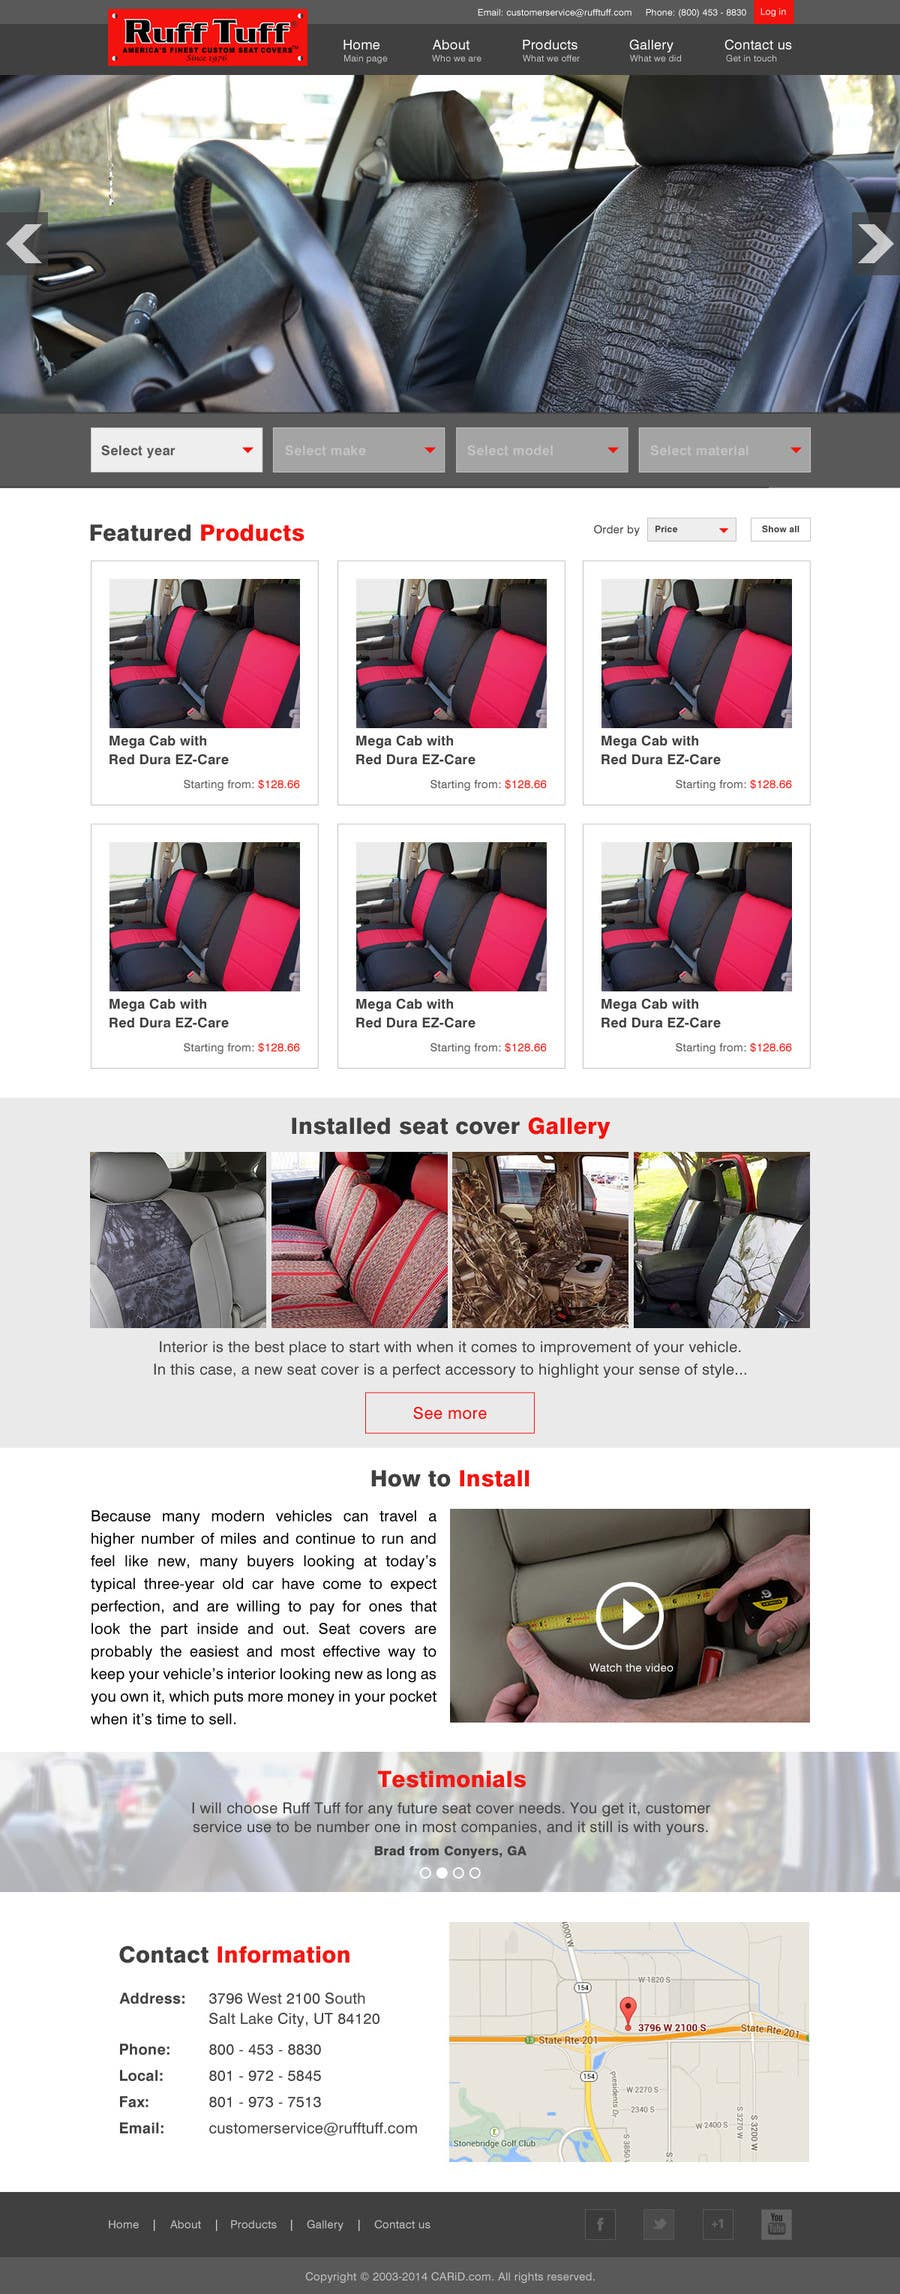 Penyertaan Peraduan #                                        8                                      untuk                                         Design a Website Mockup for an auto seat cover manufacturer